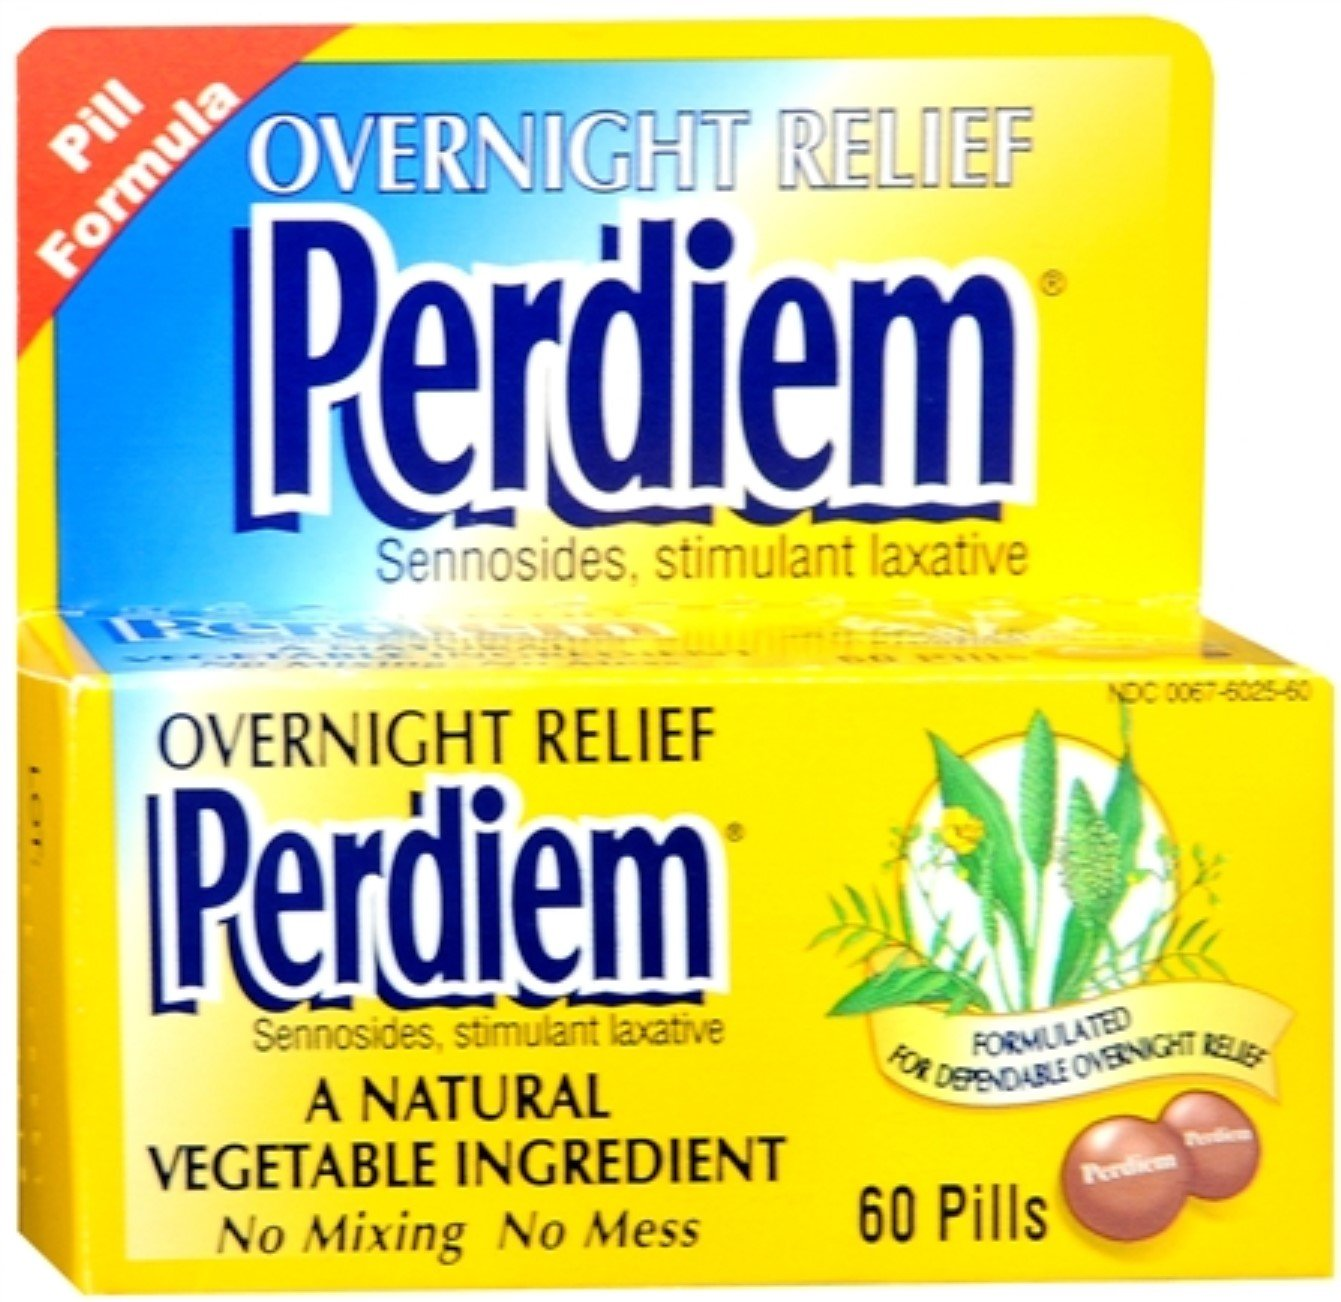 Perdiem Pills Overnight Relief 60 Each (Pack of 12)